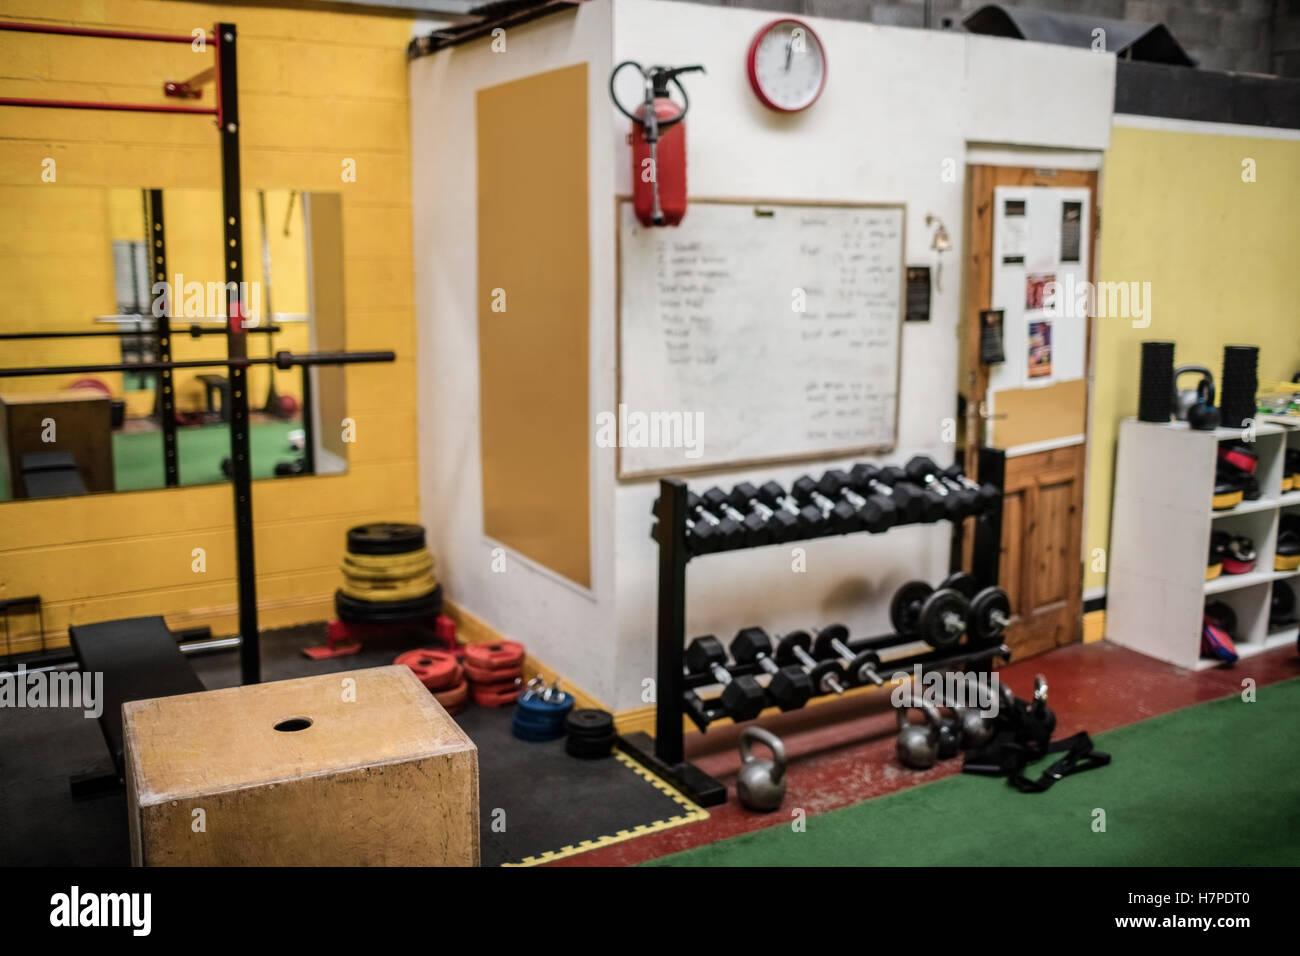 Various exercising equipment - Stock Image